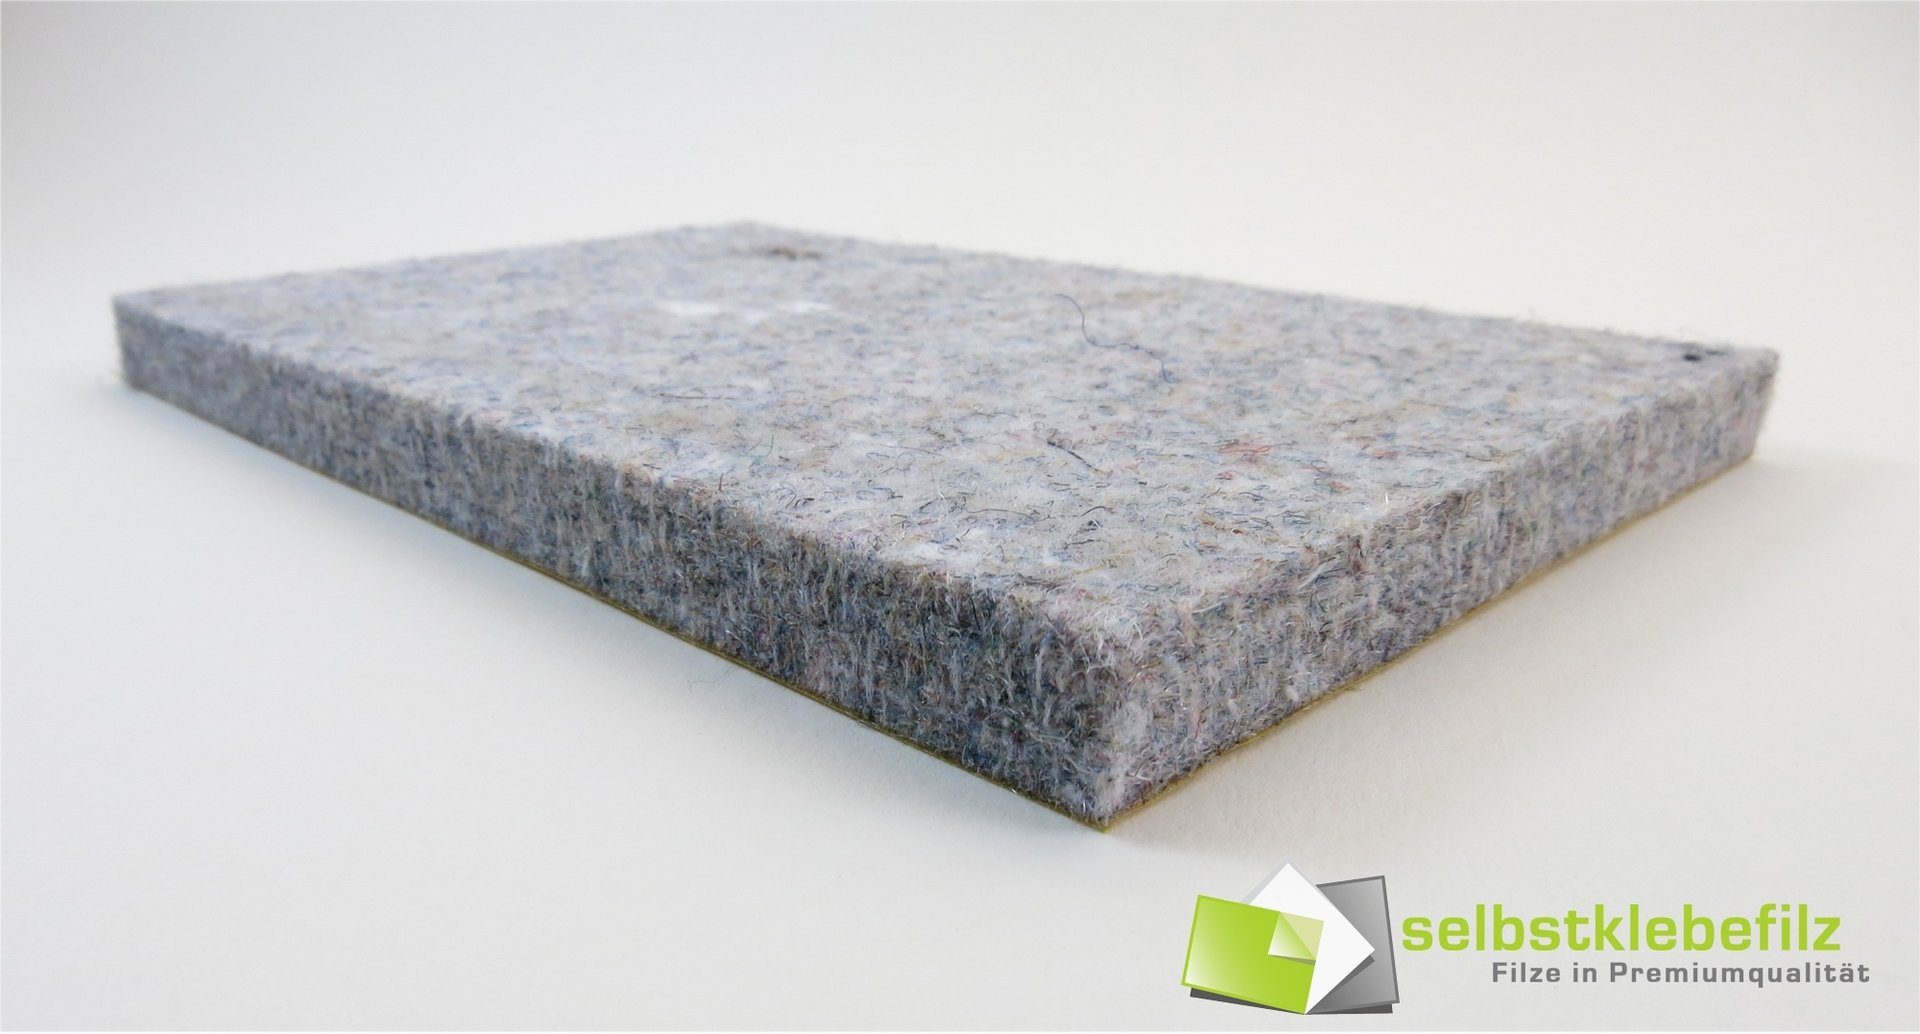 filz meterware 10mm dick filz selbstklebend grau meliert. Black Bedroom Furniture Sets. Home Design Ideas